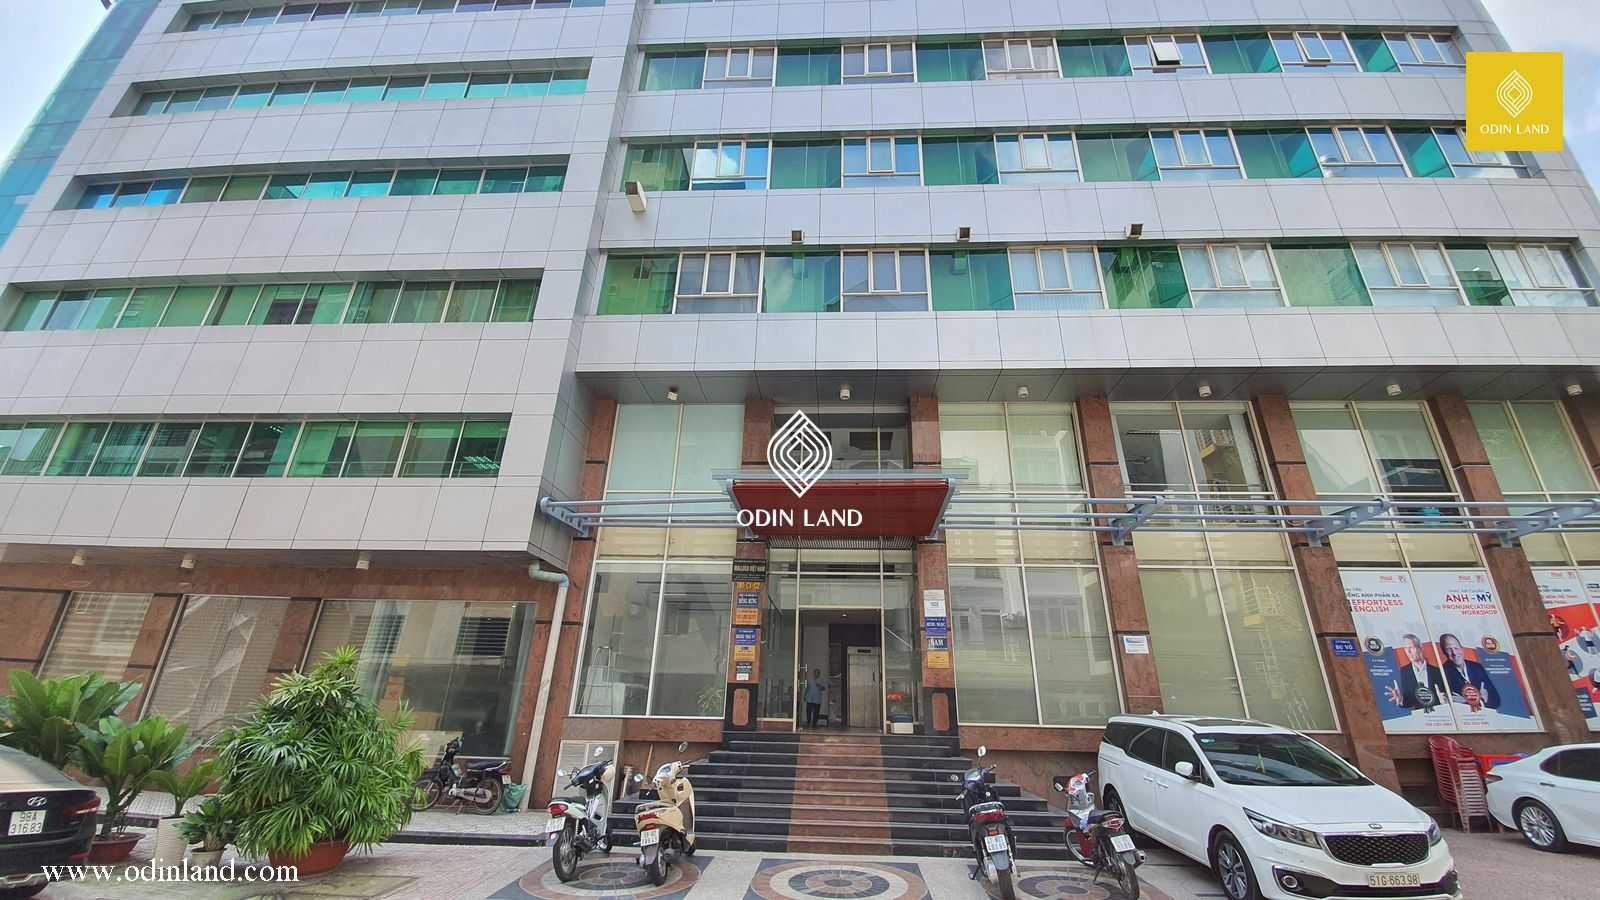 Van Phong Cho Thue Toa Nha Duc Linh Building 02